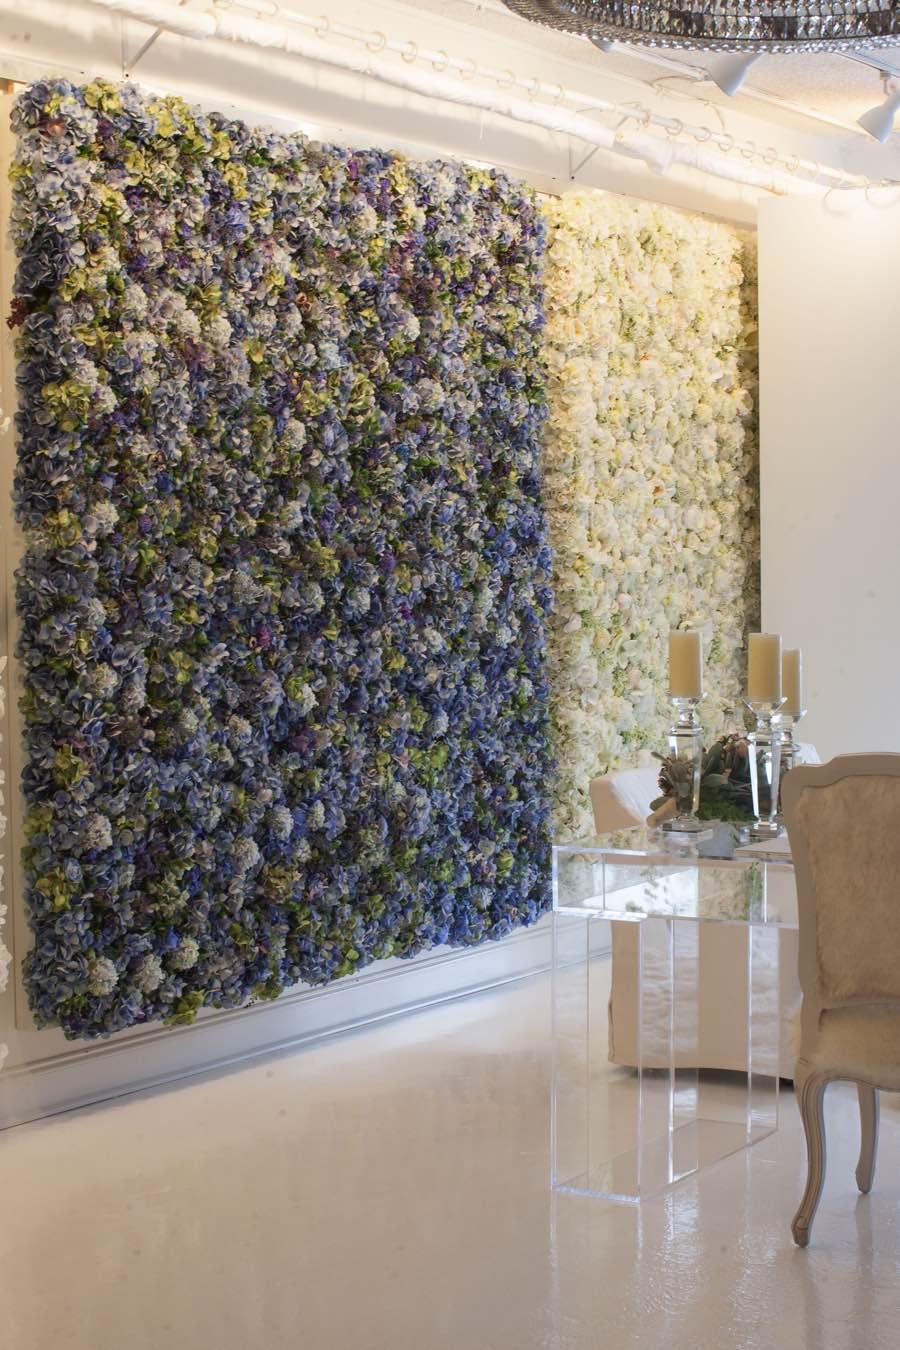 nicol-floral-design-showroom-6